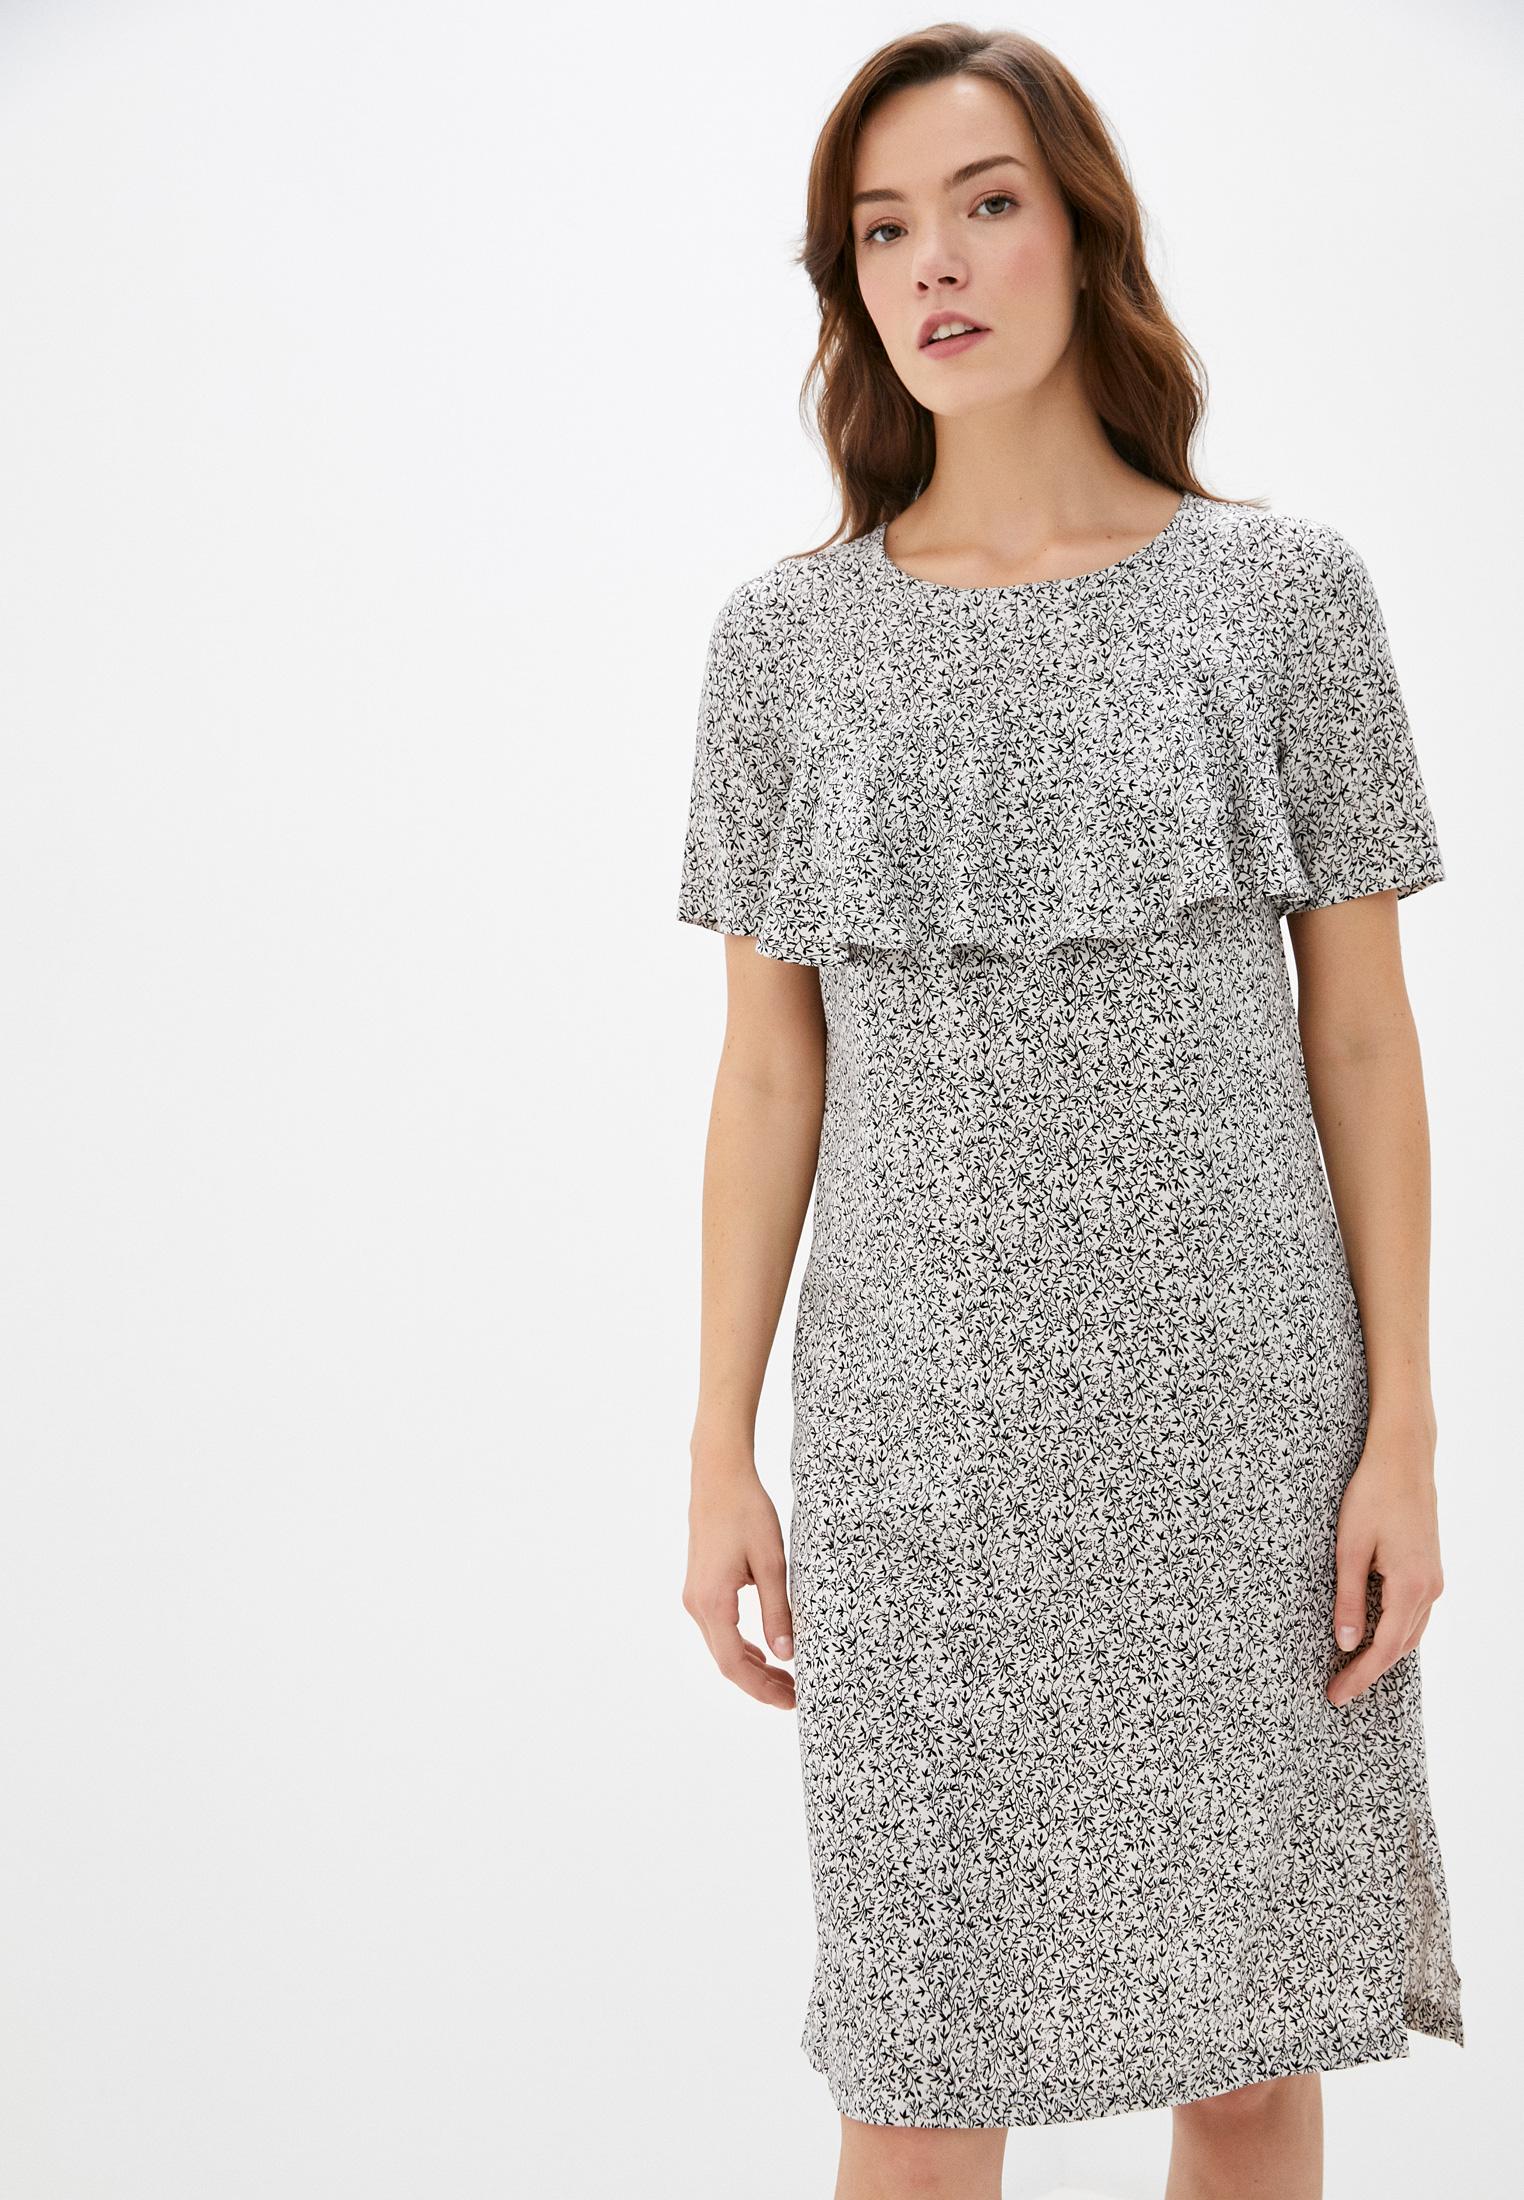 Платье Finn Flare (Фин Флаер) S18-11015